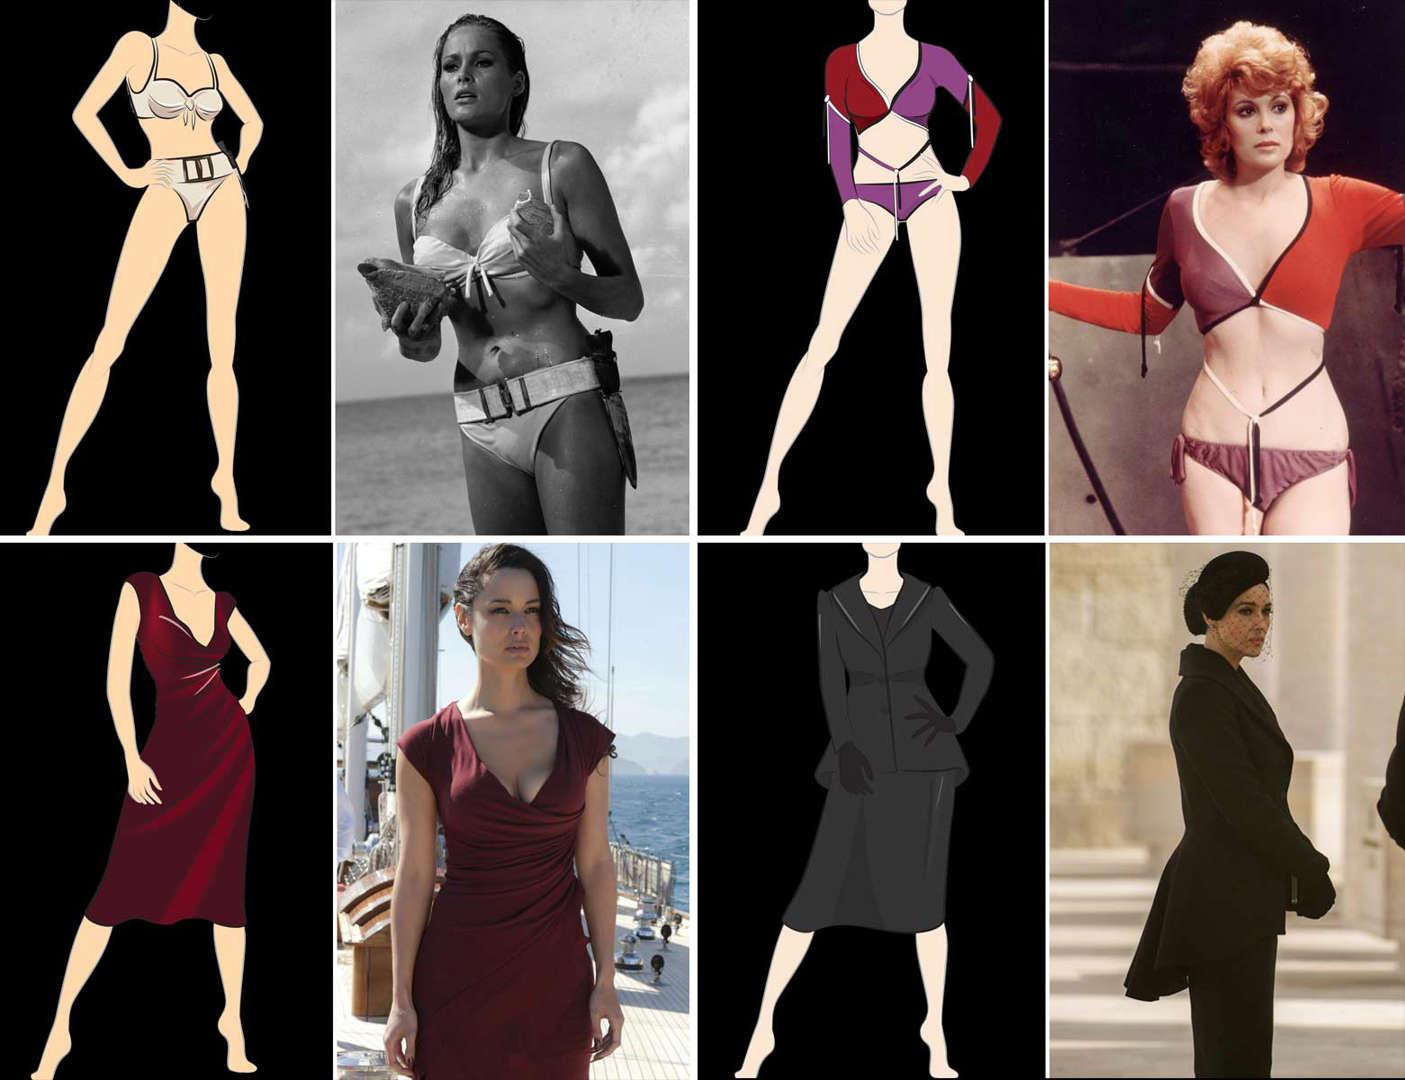 79b560f0e4e Bond-mode: Se de flotteste Bond-babe outfits gennem tiden